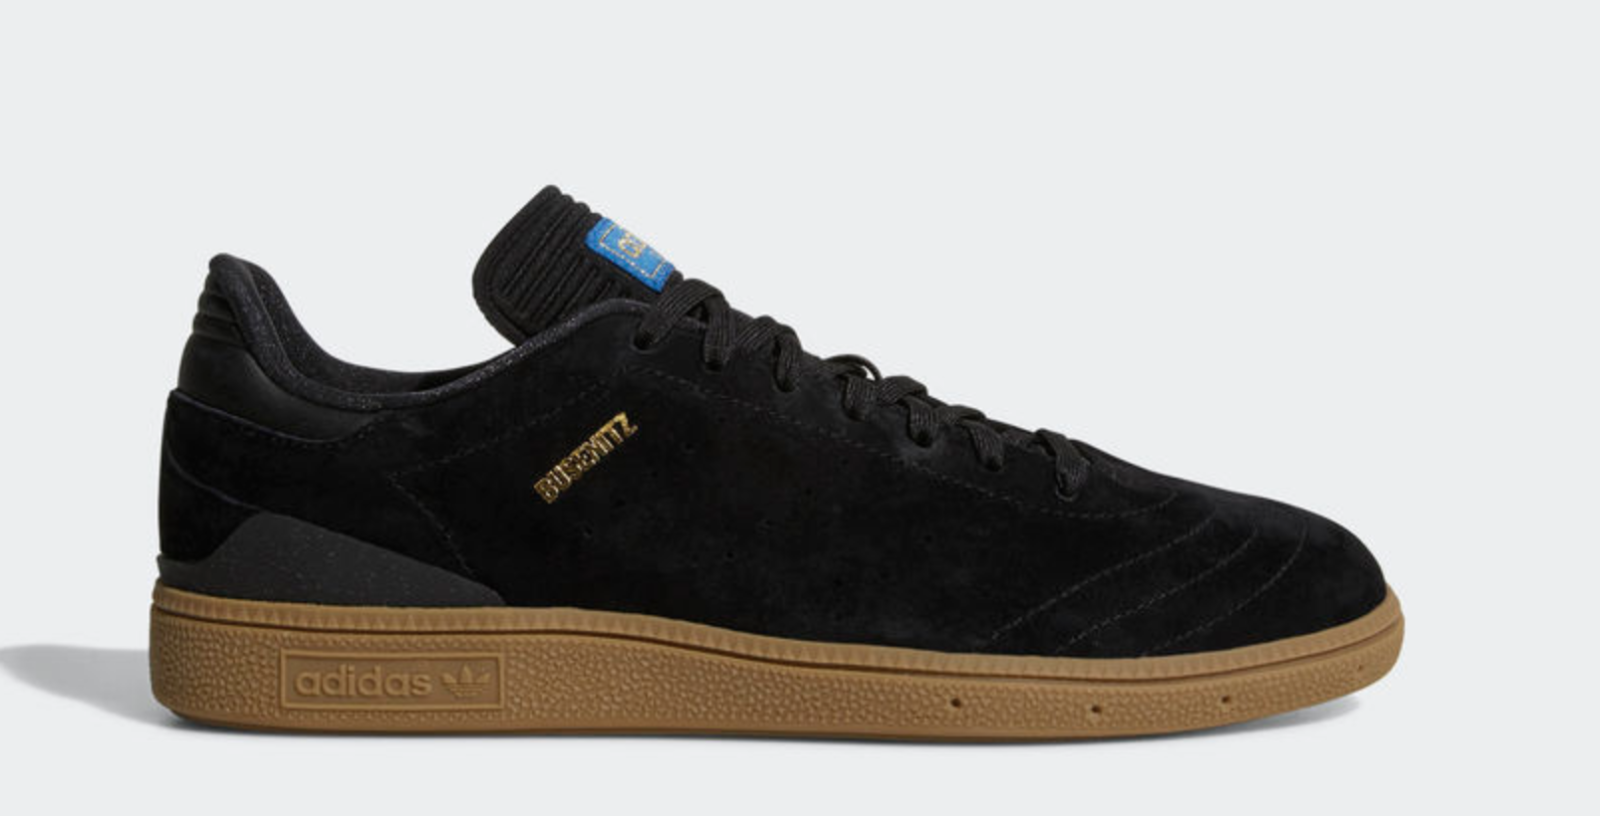 NEW adidas Originals BUSENITZ RX SHOES CQ1161 Black Gold Brown Gum Skate am1